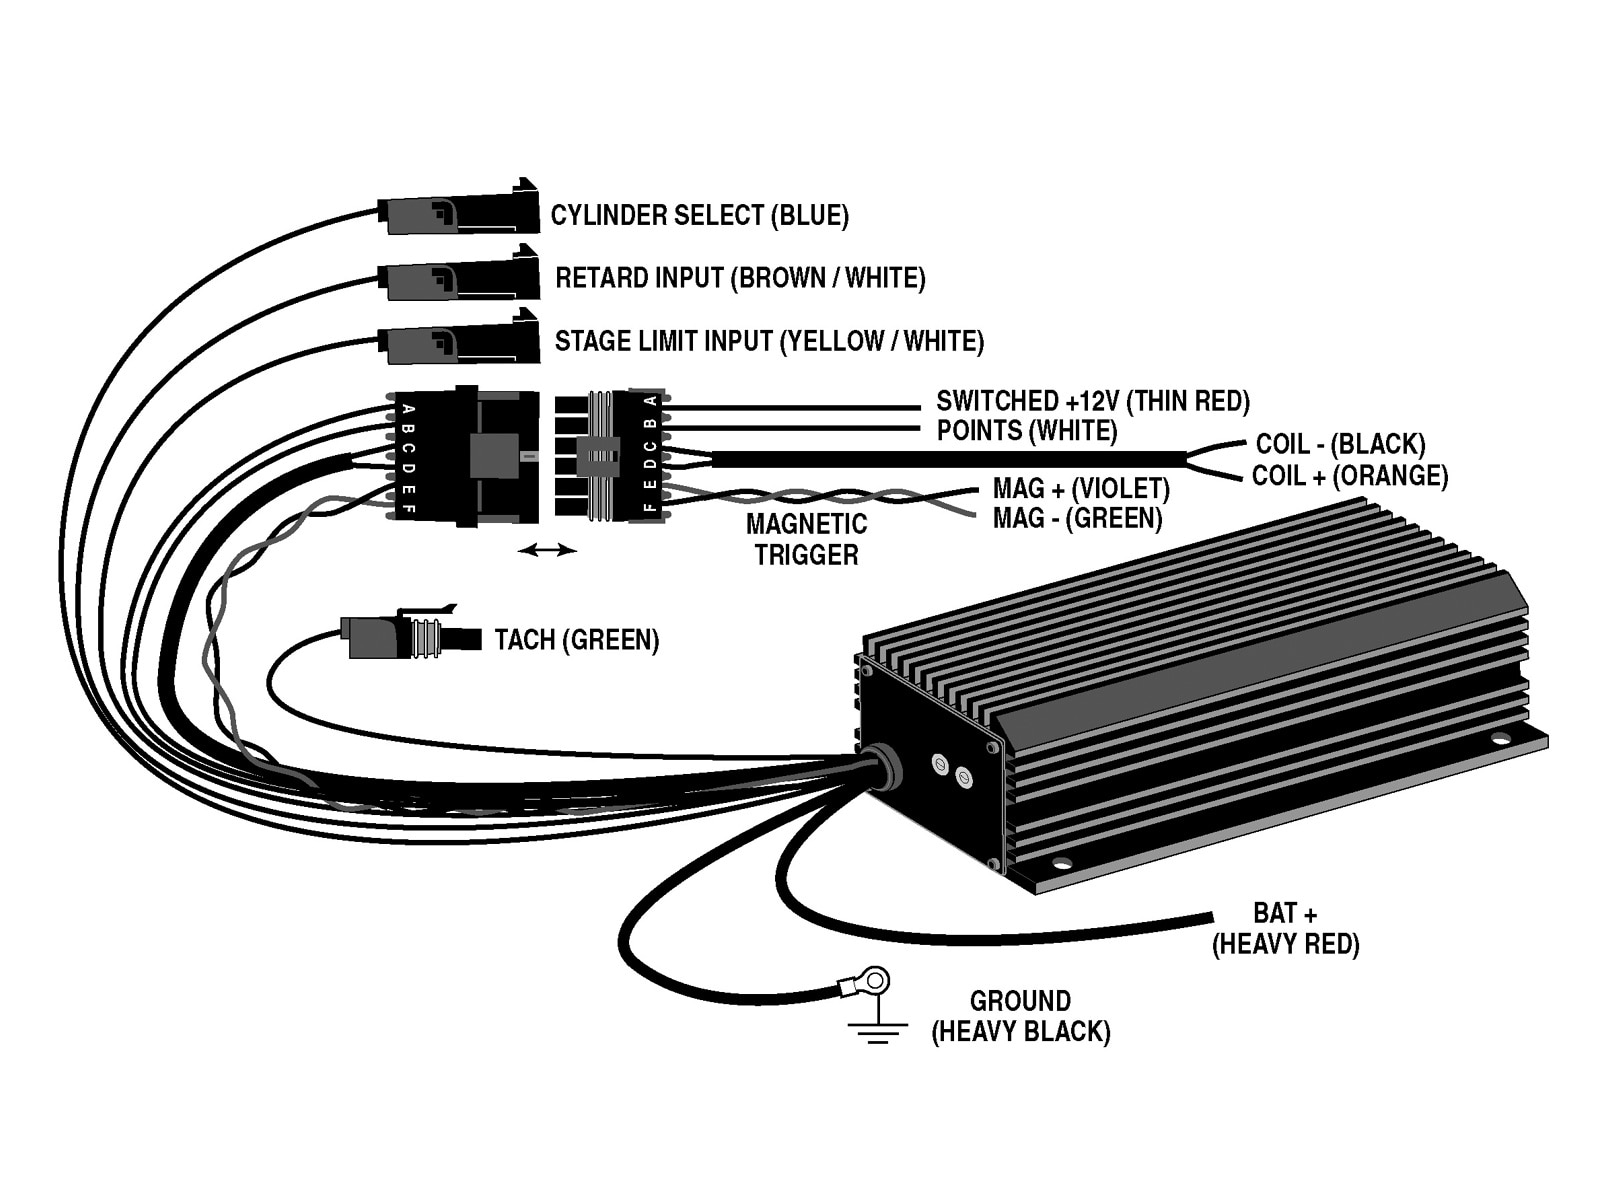 Crane Ignition Wiring Diagram | Wiring Diagram